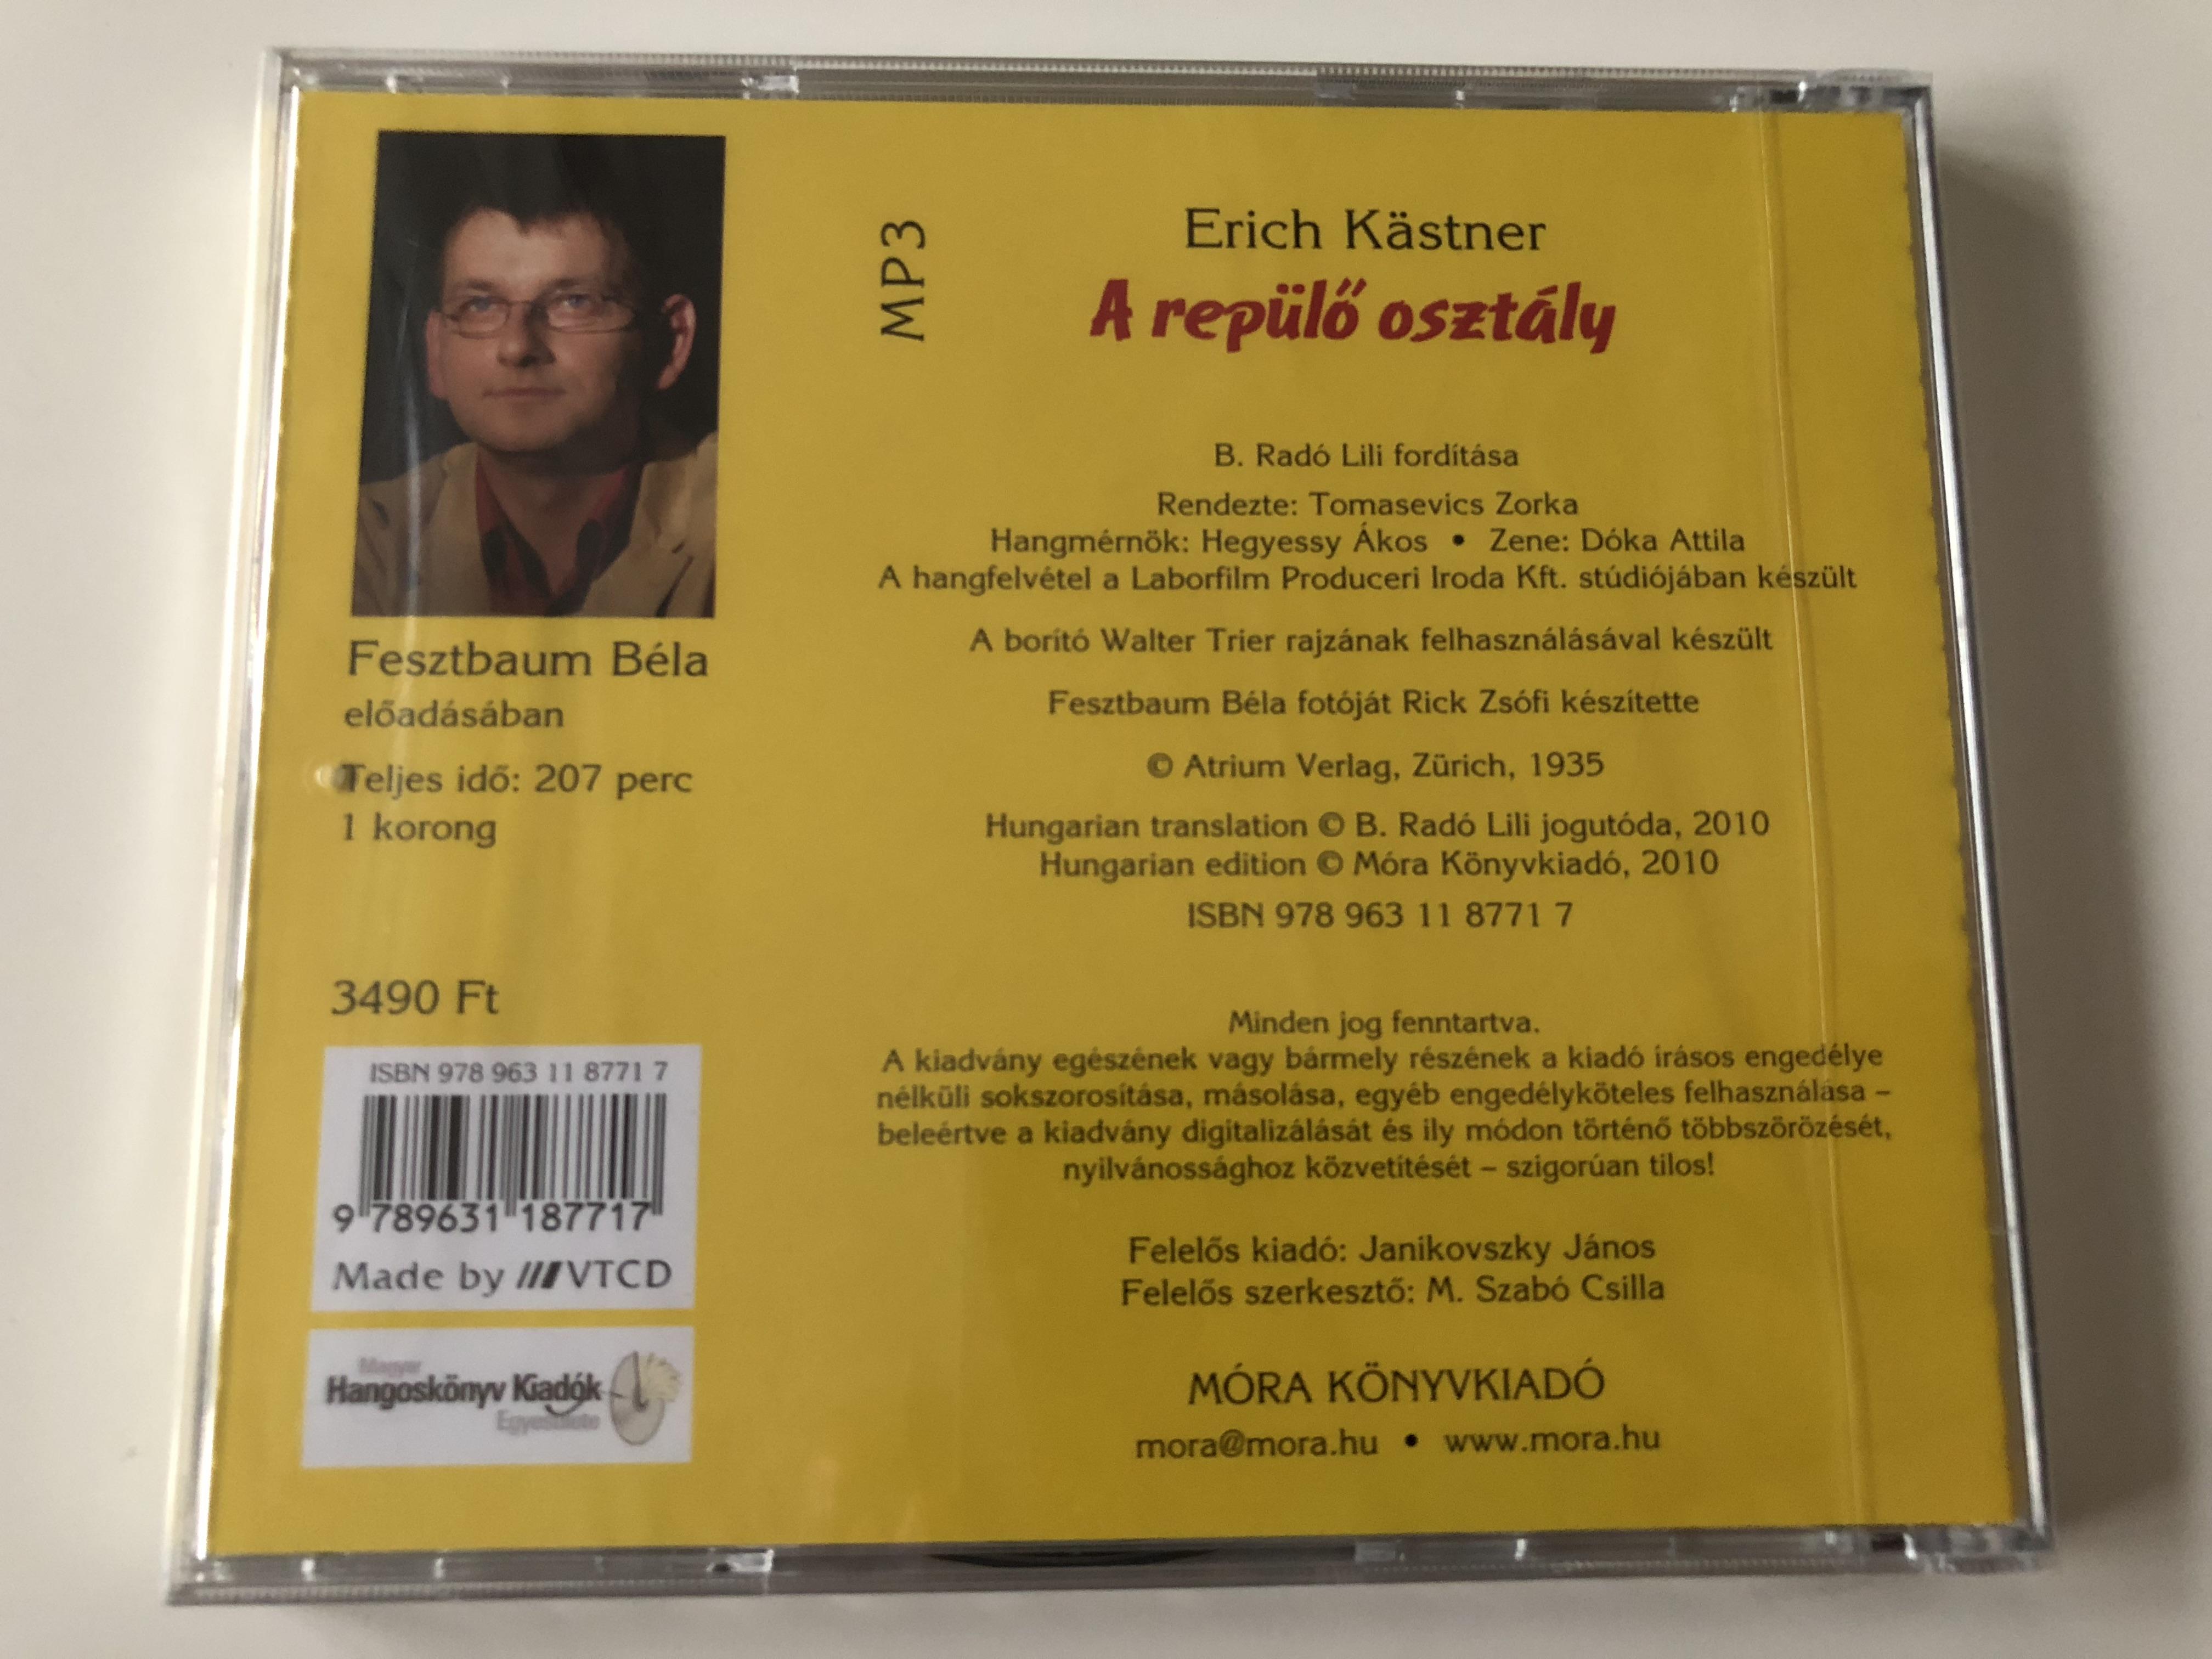 a-rep-l-oszt-ly-by-erich-k-stner-hungarian-audio-book-das-fliegende-klassenzimmer-the-flying-classroom-read-by-fesztbaum-b-la-translation-b.-rad-lili-m-ra-hangosk-nyv-mp3-cd-2010-3-.jpg